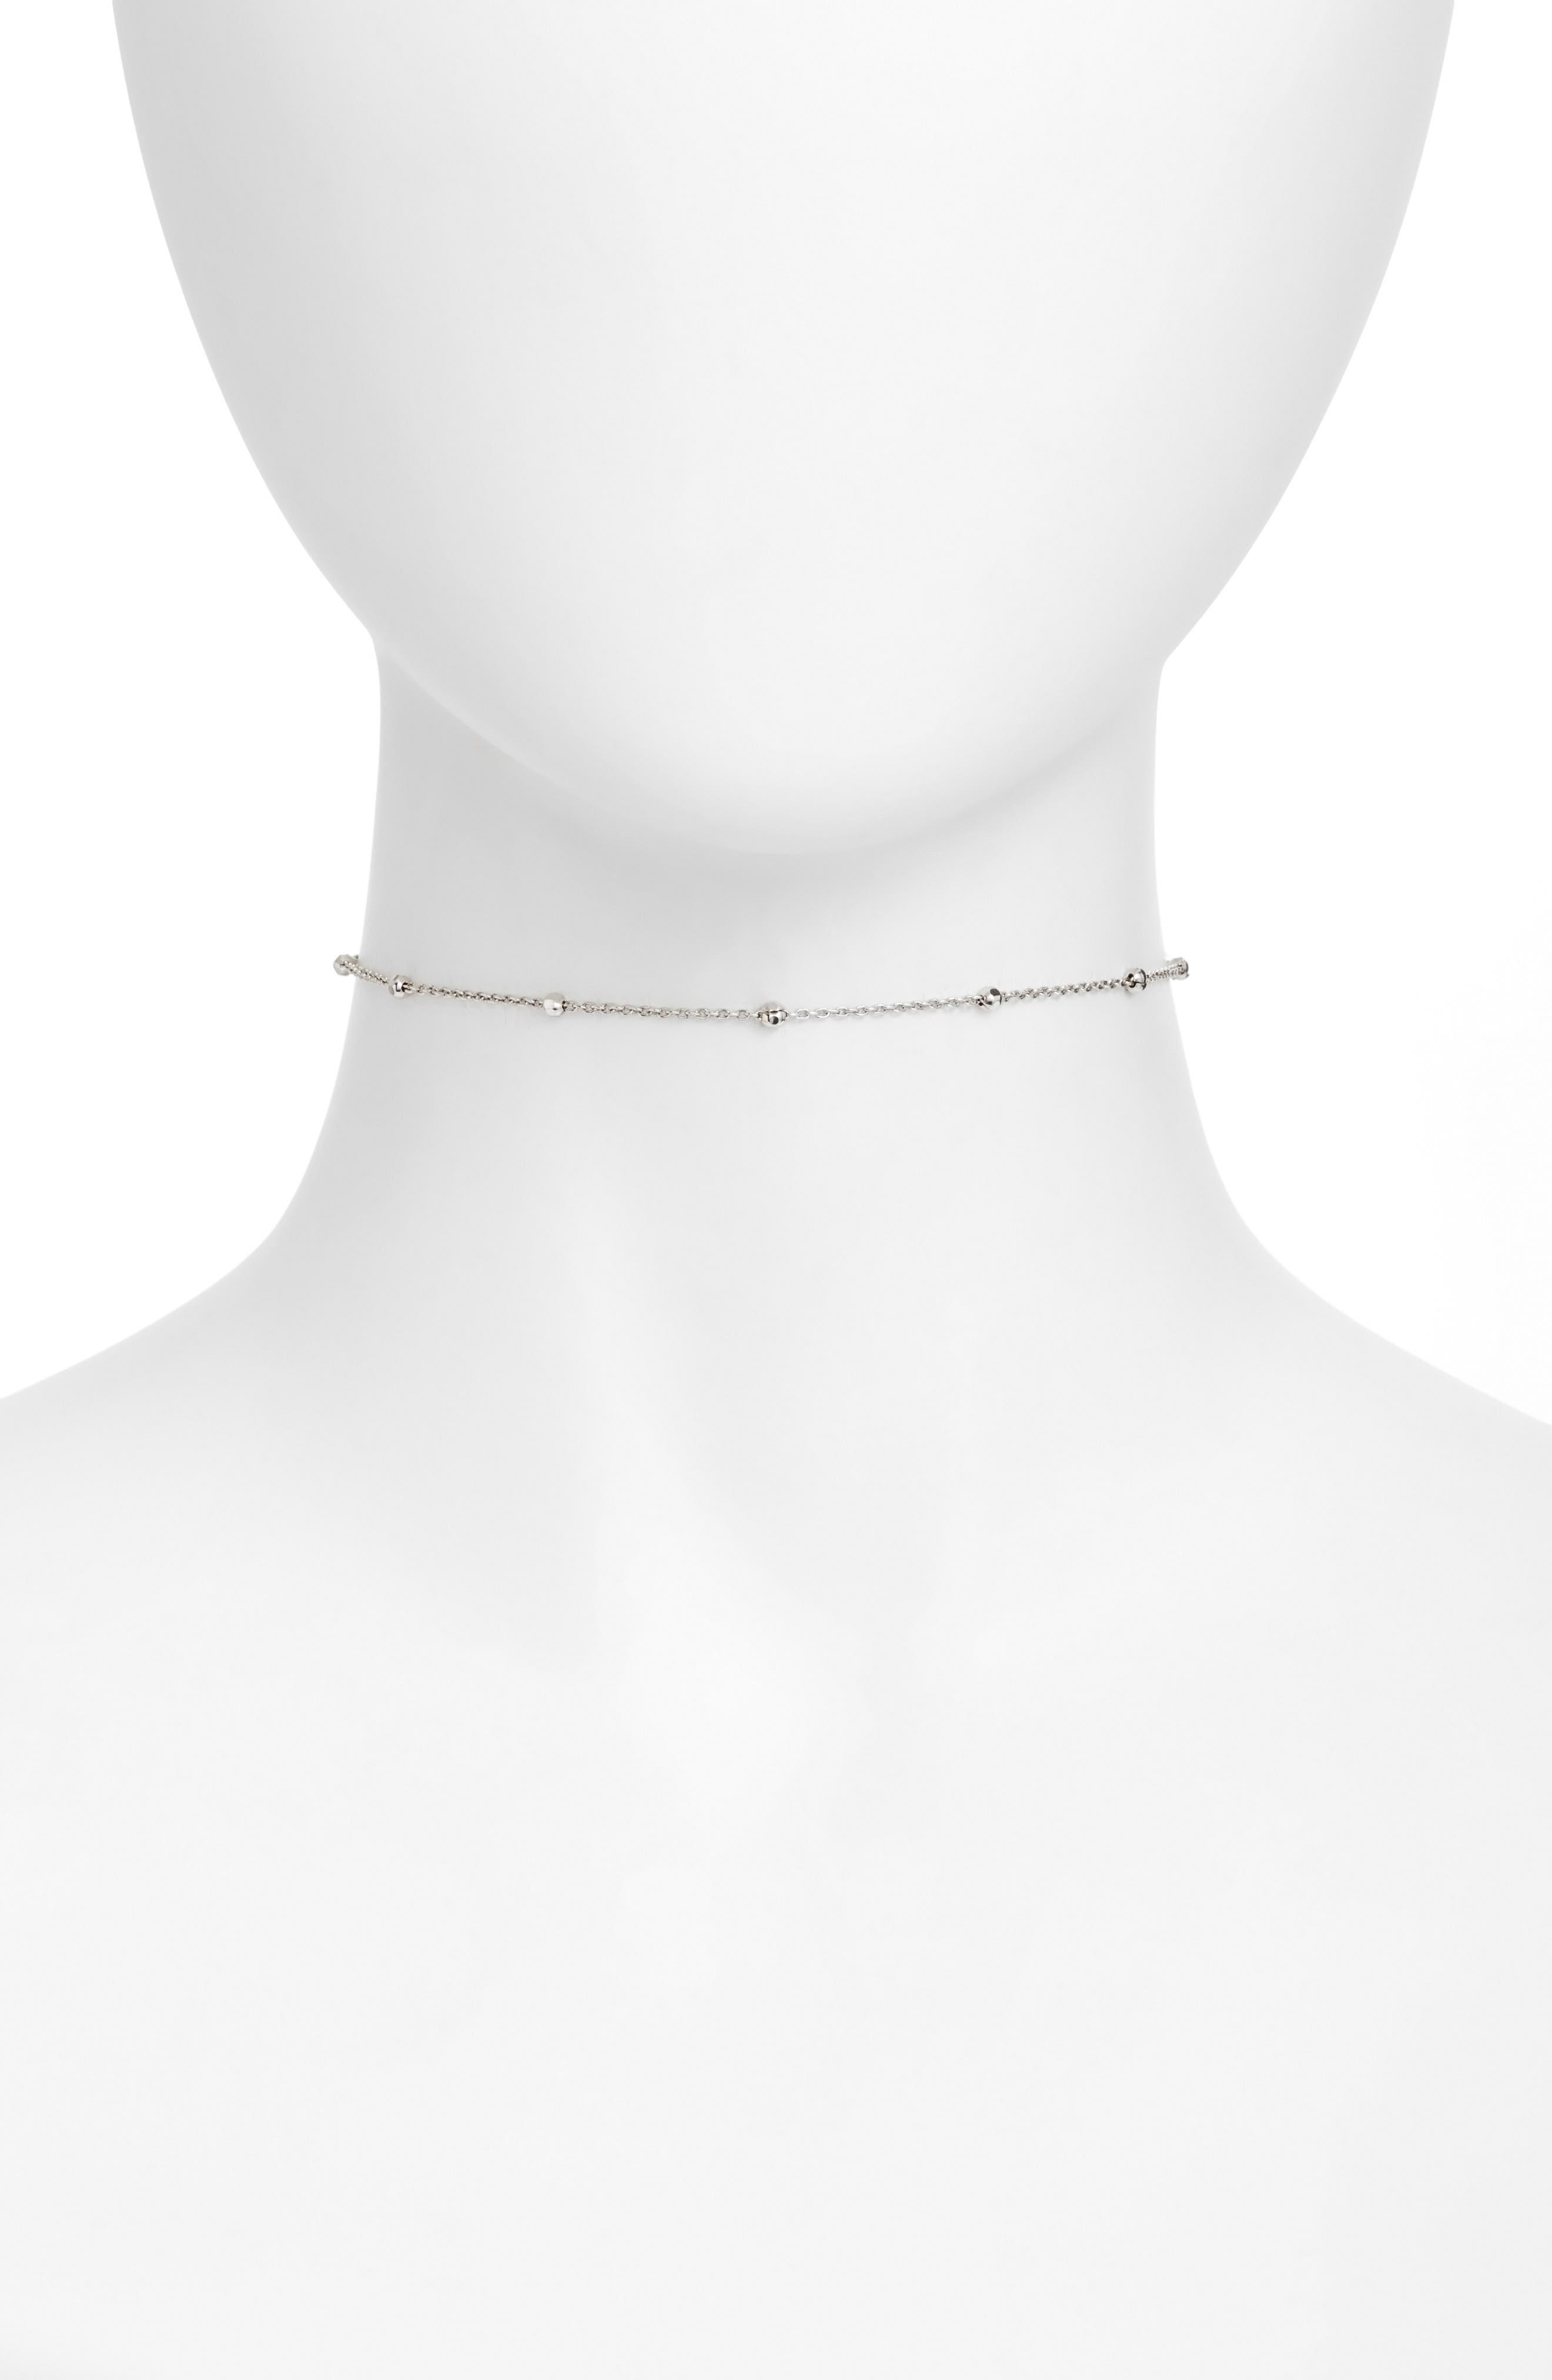 Alternate Image 1 Selected - Argento Vivo Choker Necklace